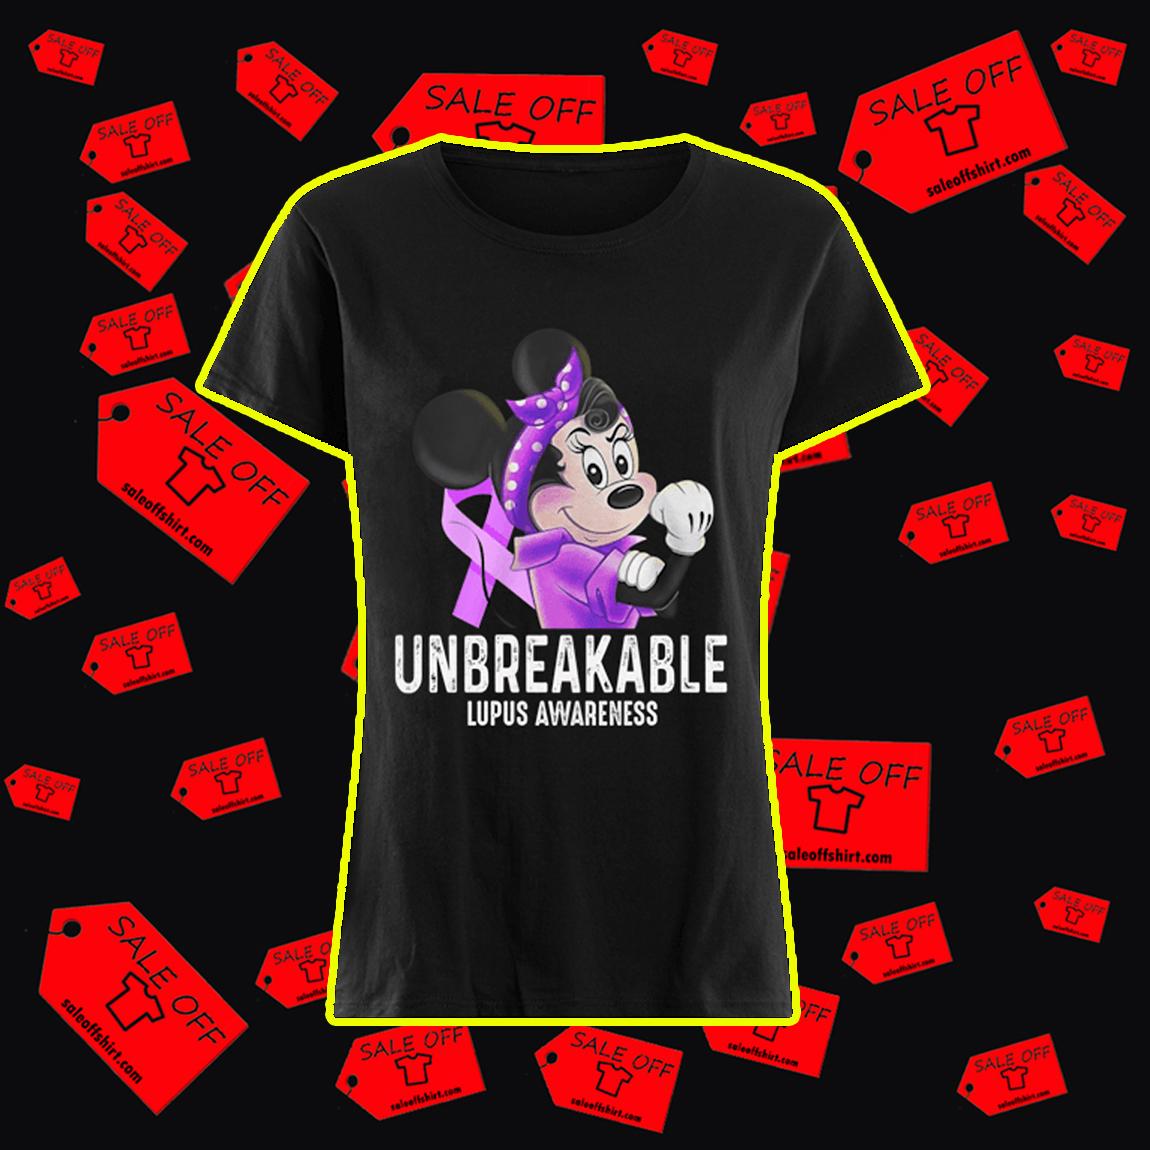 Disney Minnie Unbreakable Lupus Awareness shirt